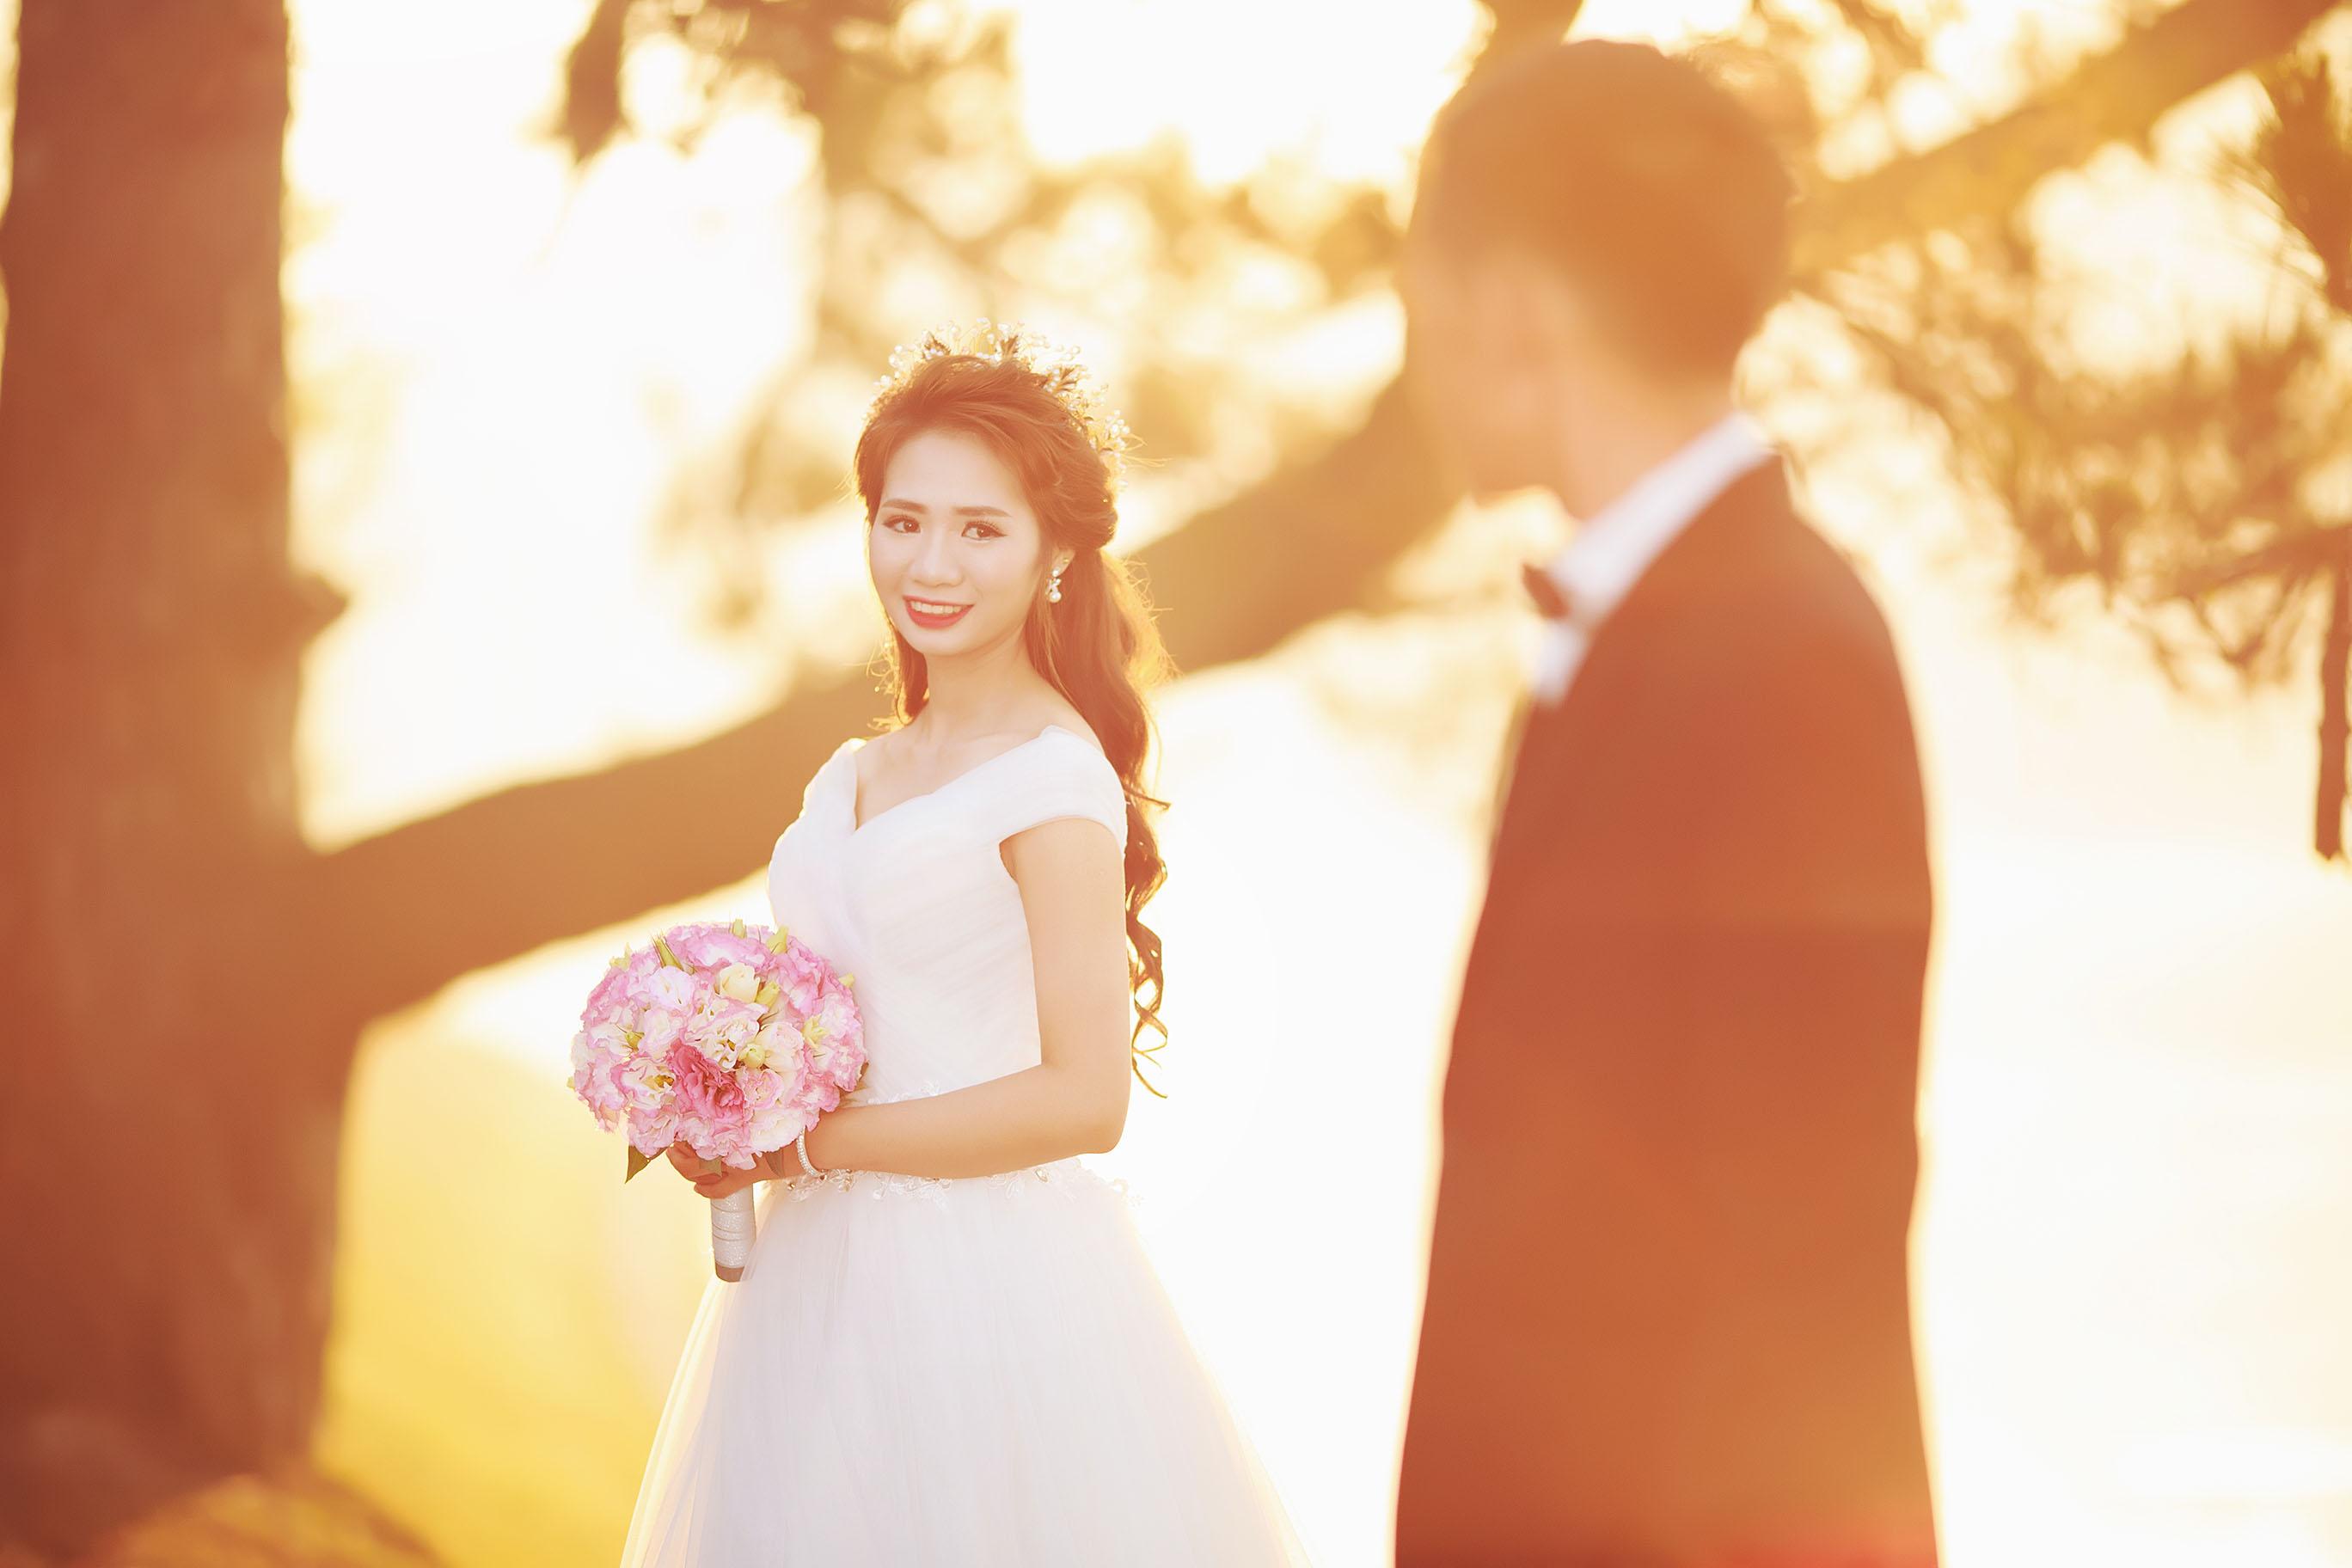 alohastudio-wedding-dia-chi-studio-chup-hinh-cuoi-dep-tai-tp-hcm-13